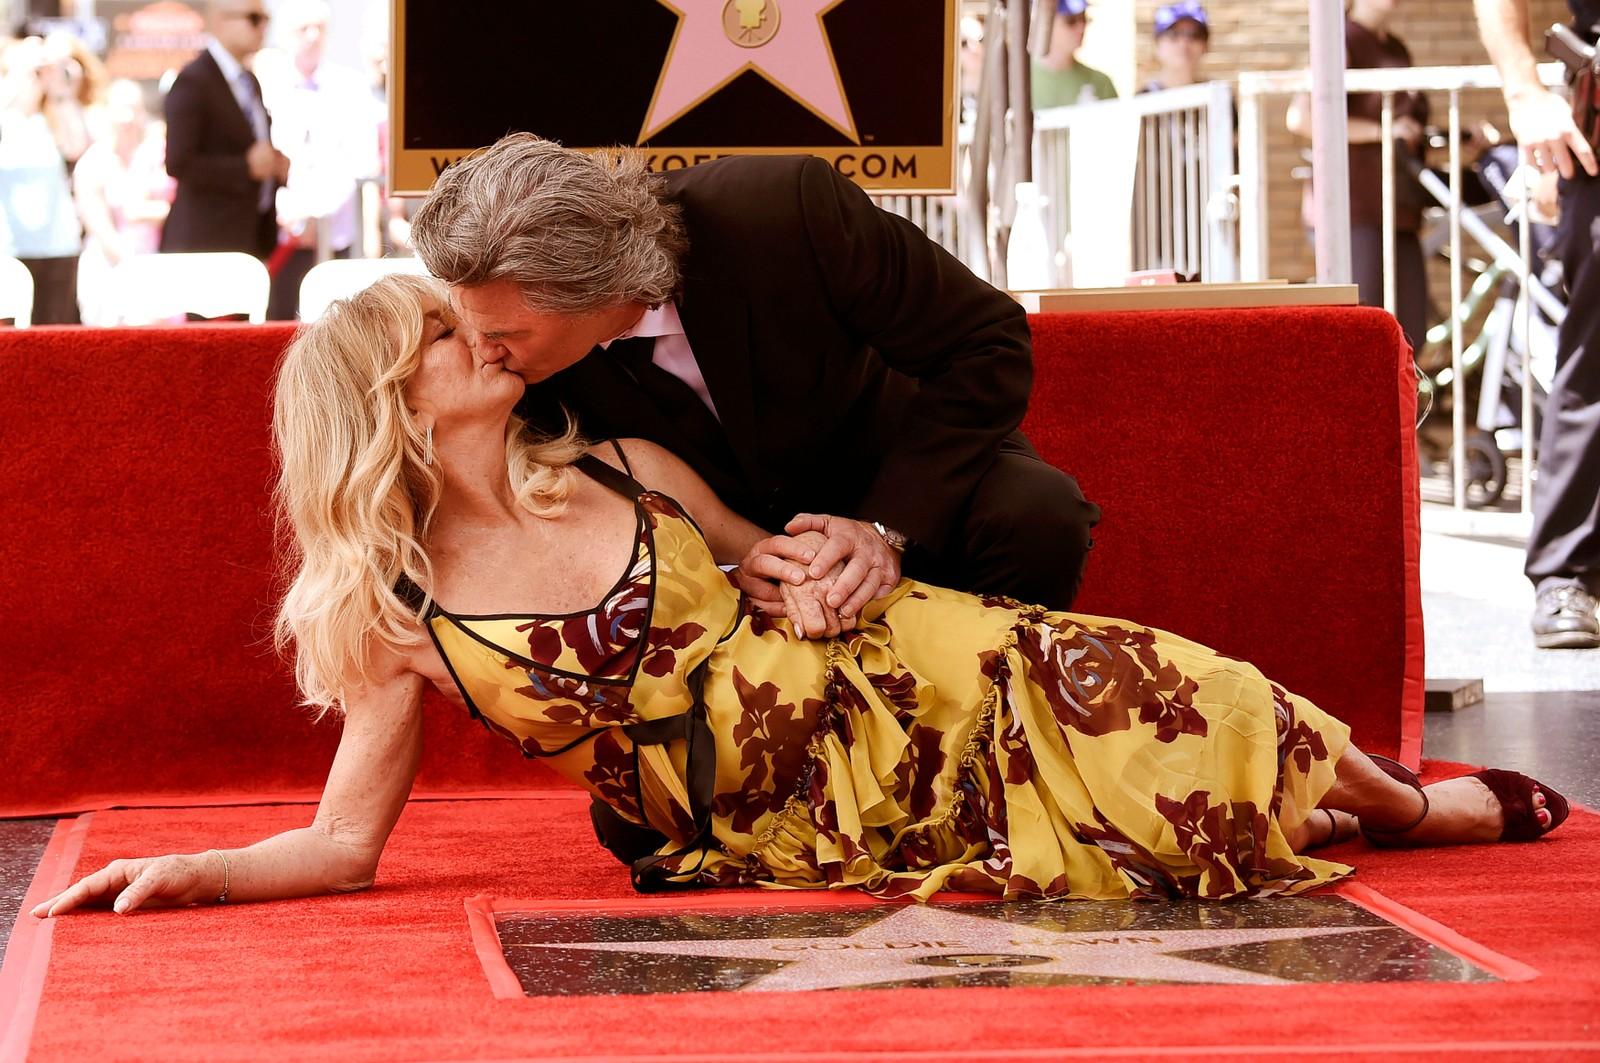 Skuespillerne Goldie Hawn og Kurt Russell deler et øyeblikk. De ble beæret med hver sin stjerne på Hollywood Walk of Fame.